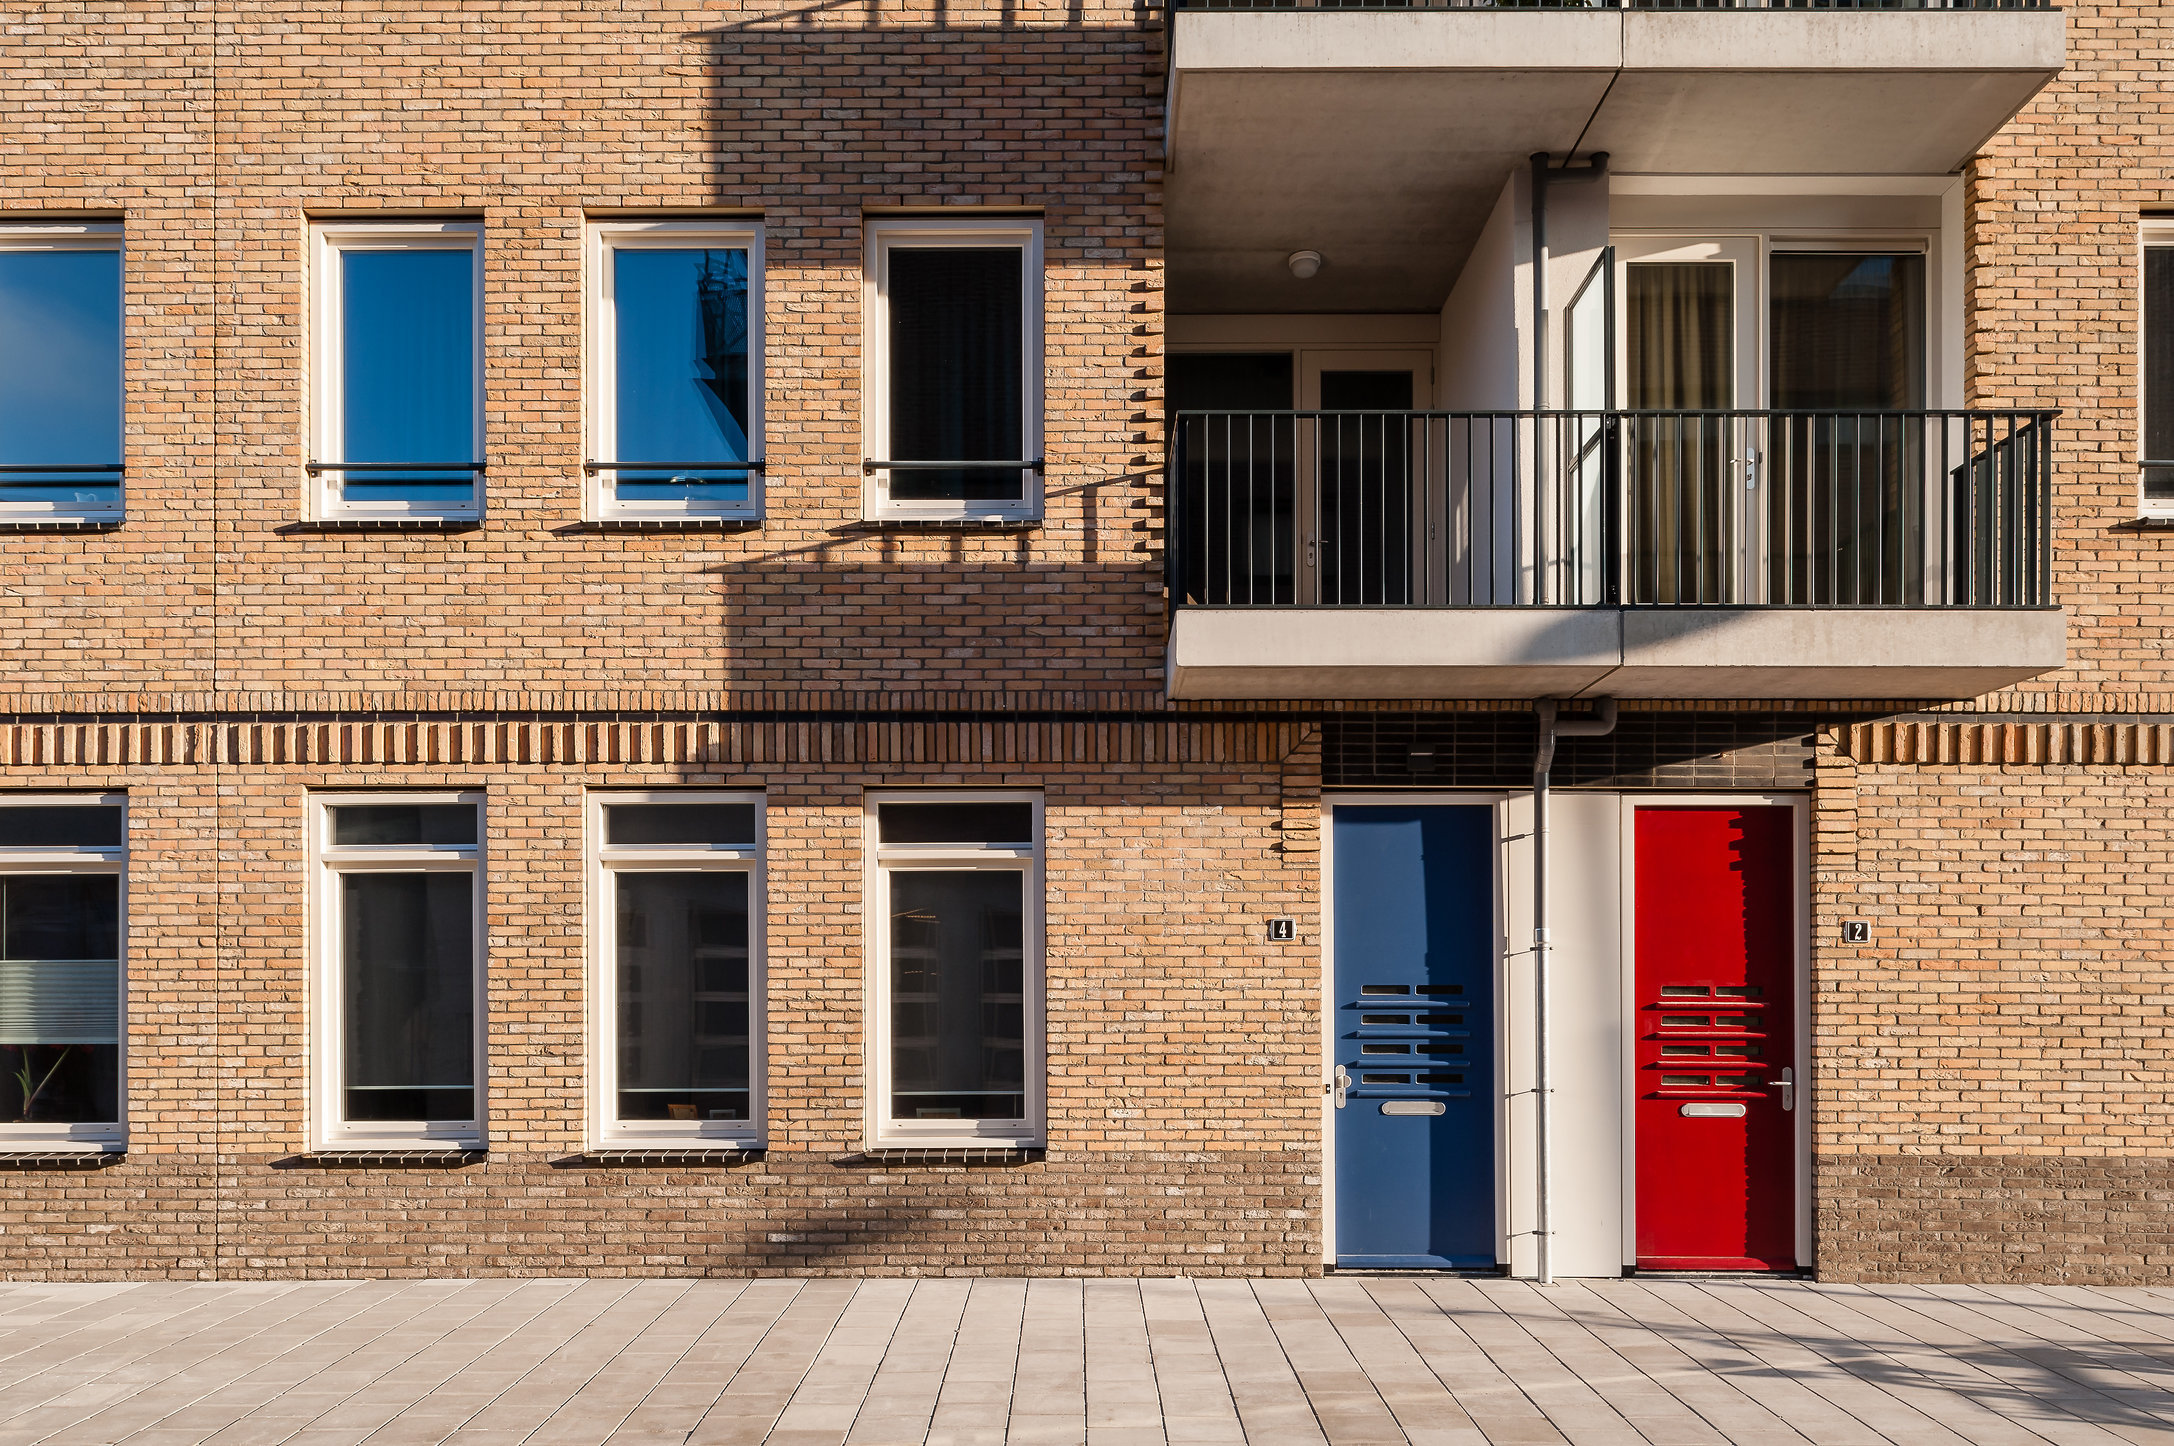 Wicherskwartier, Amsterdam i.o.v. a.s.r. vastgoedvermogensbeheer